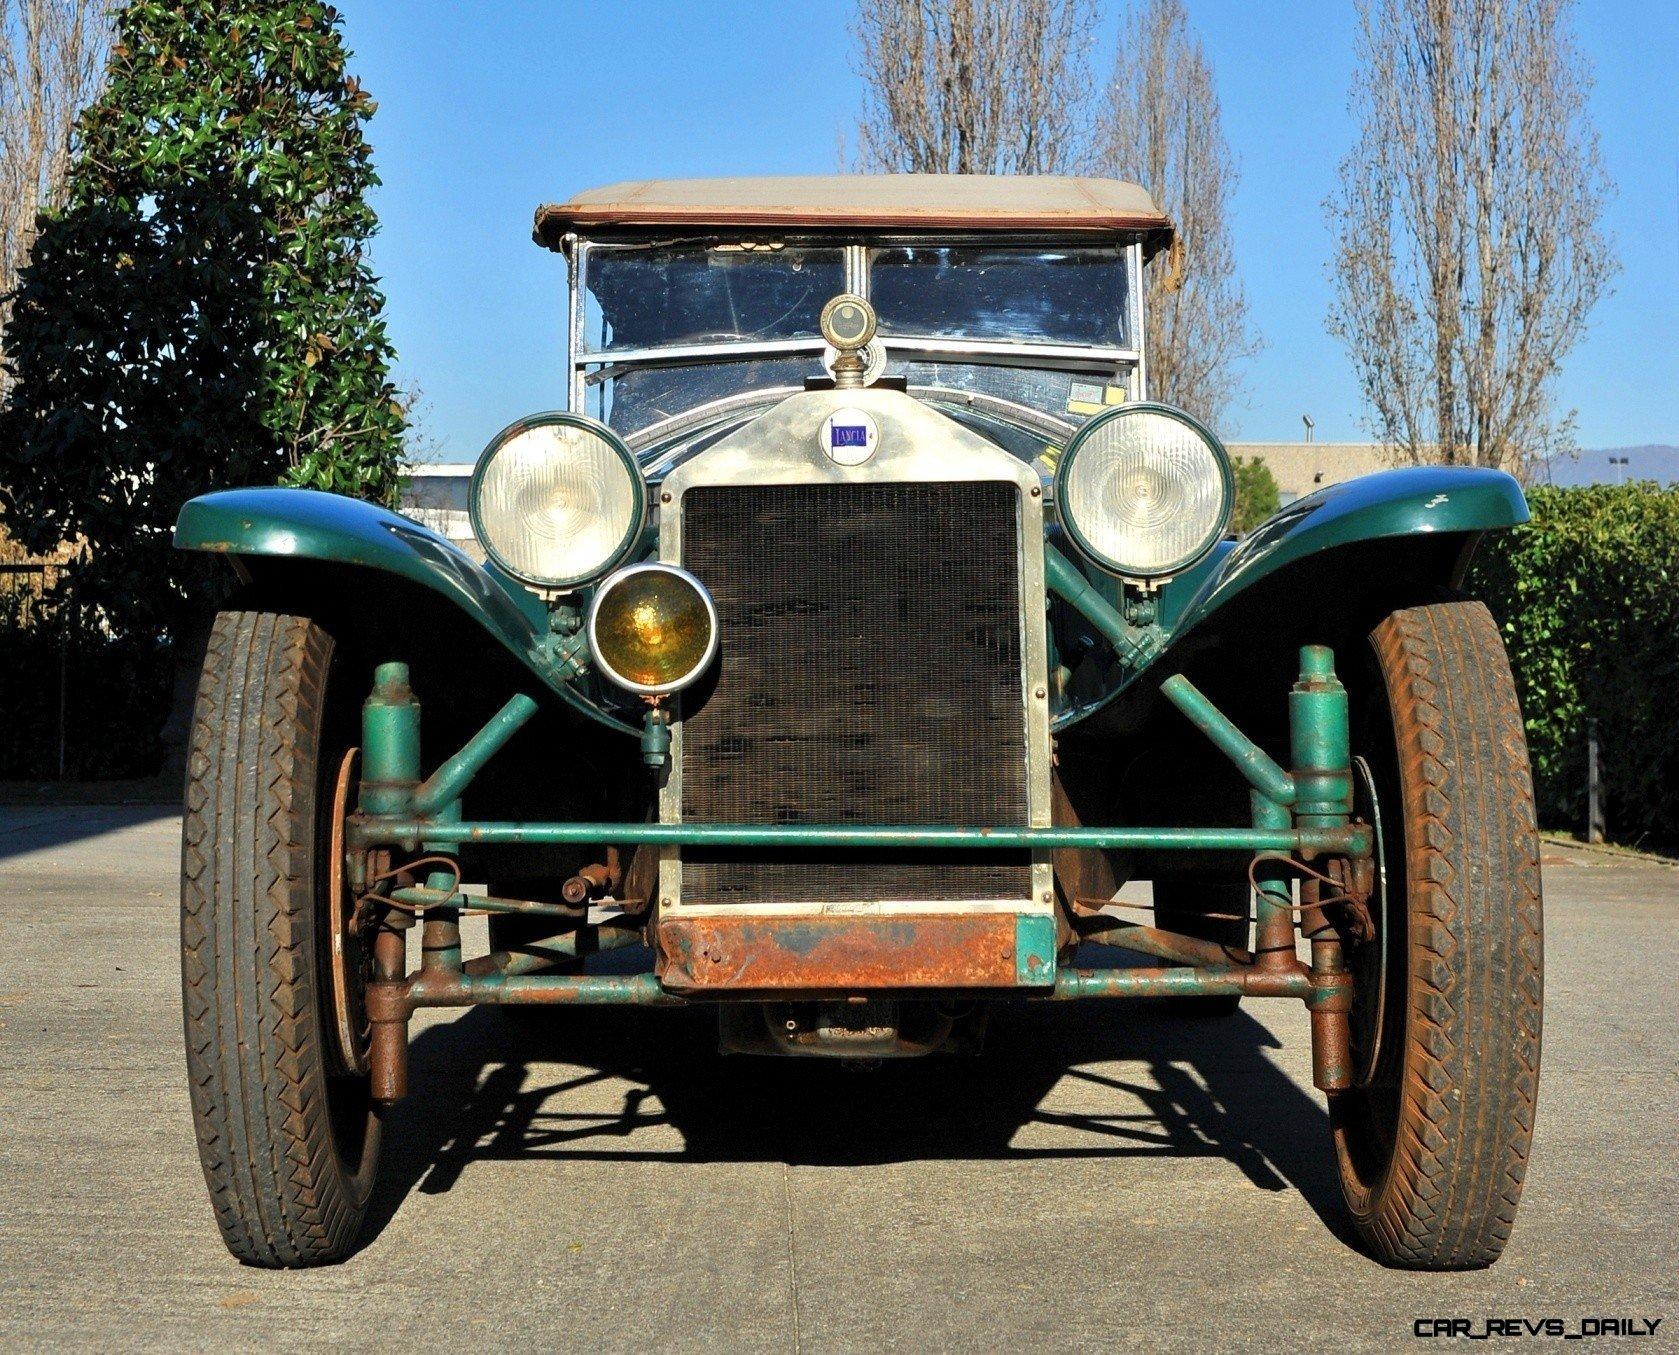 Wealth Dreams -- 1930 Lancia Lambda 8 Sports Tourer Seeks New Home -- My Home 6